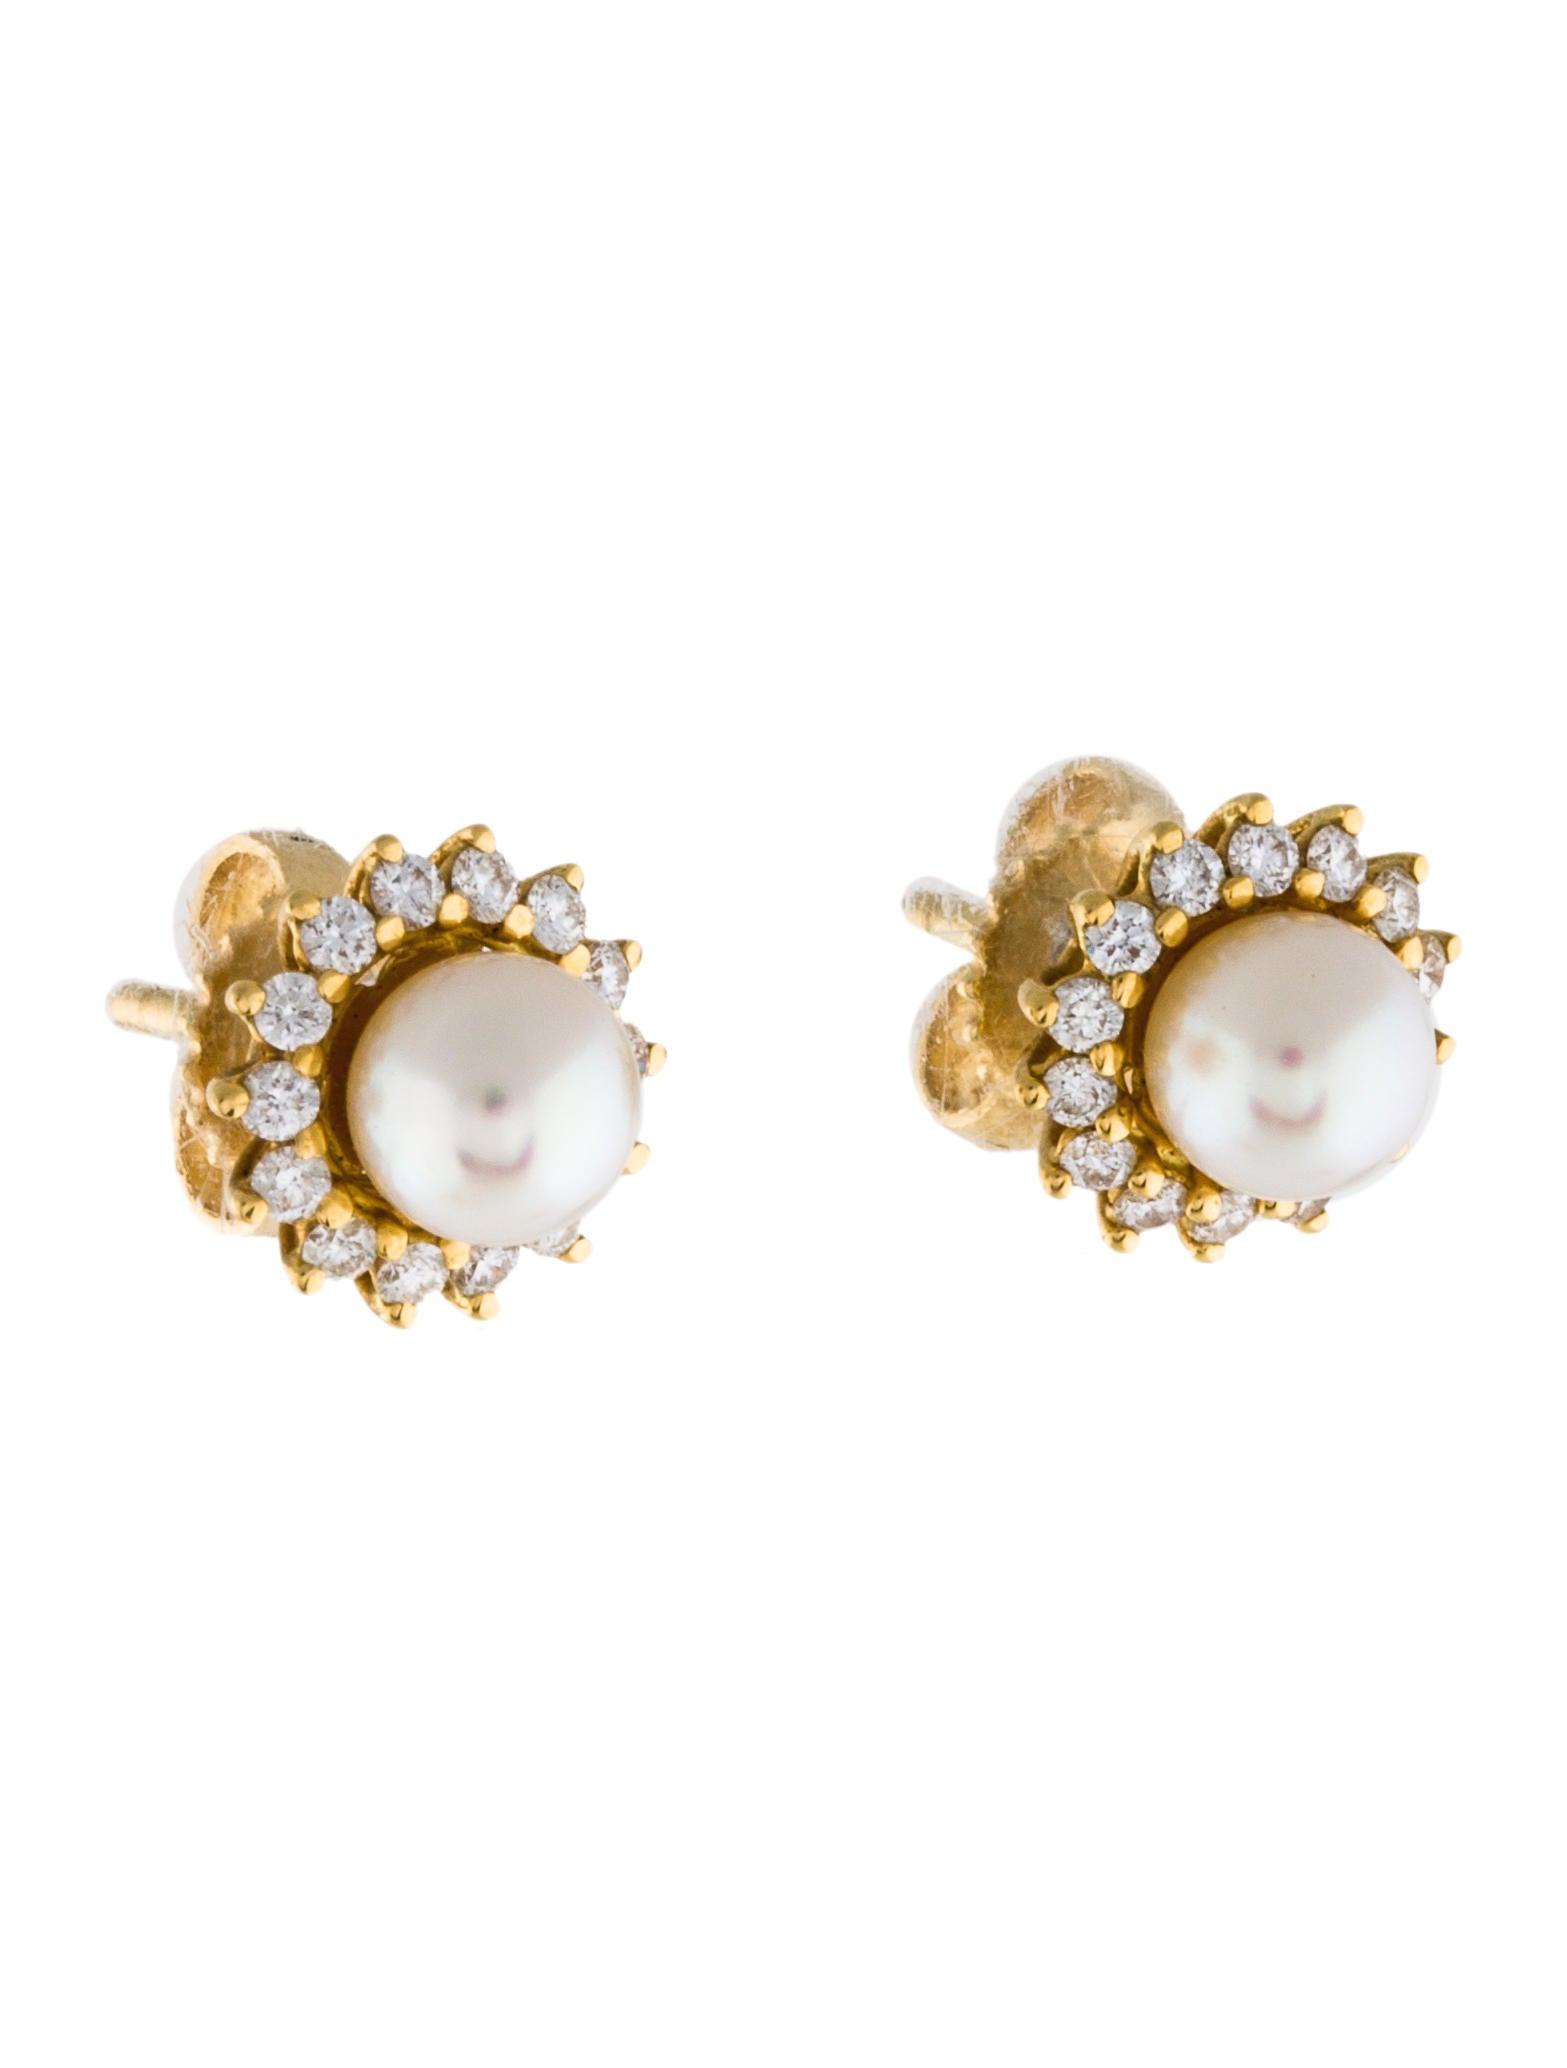 Tiffany & Co 18k Pearl & Diamond Stud Earrings  Earrings. Virgin Mary Medallion. Seiko 4402 Medallion. 50th Wedding Medallion. Etsy Medallion. Anchor Medallion. Mary Pendant Medallion. Jewelry Medallion. Glass Medallion